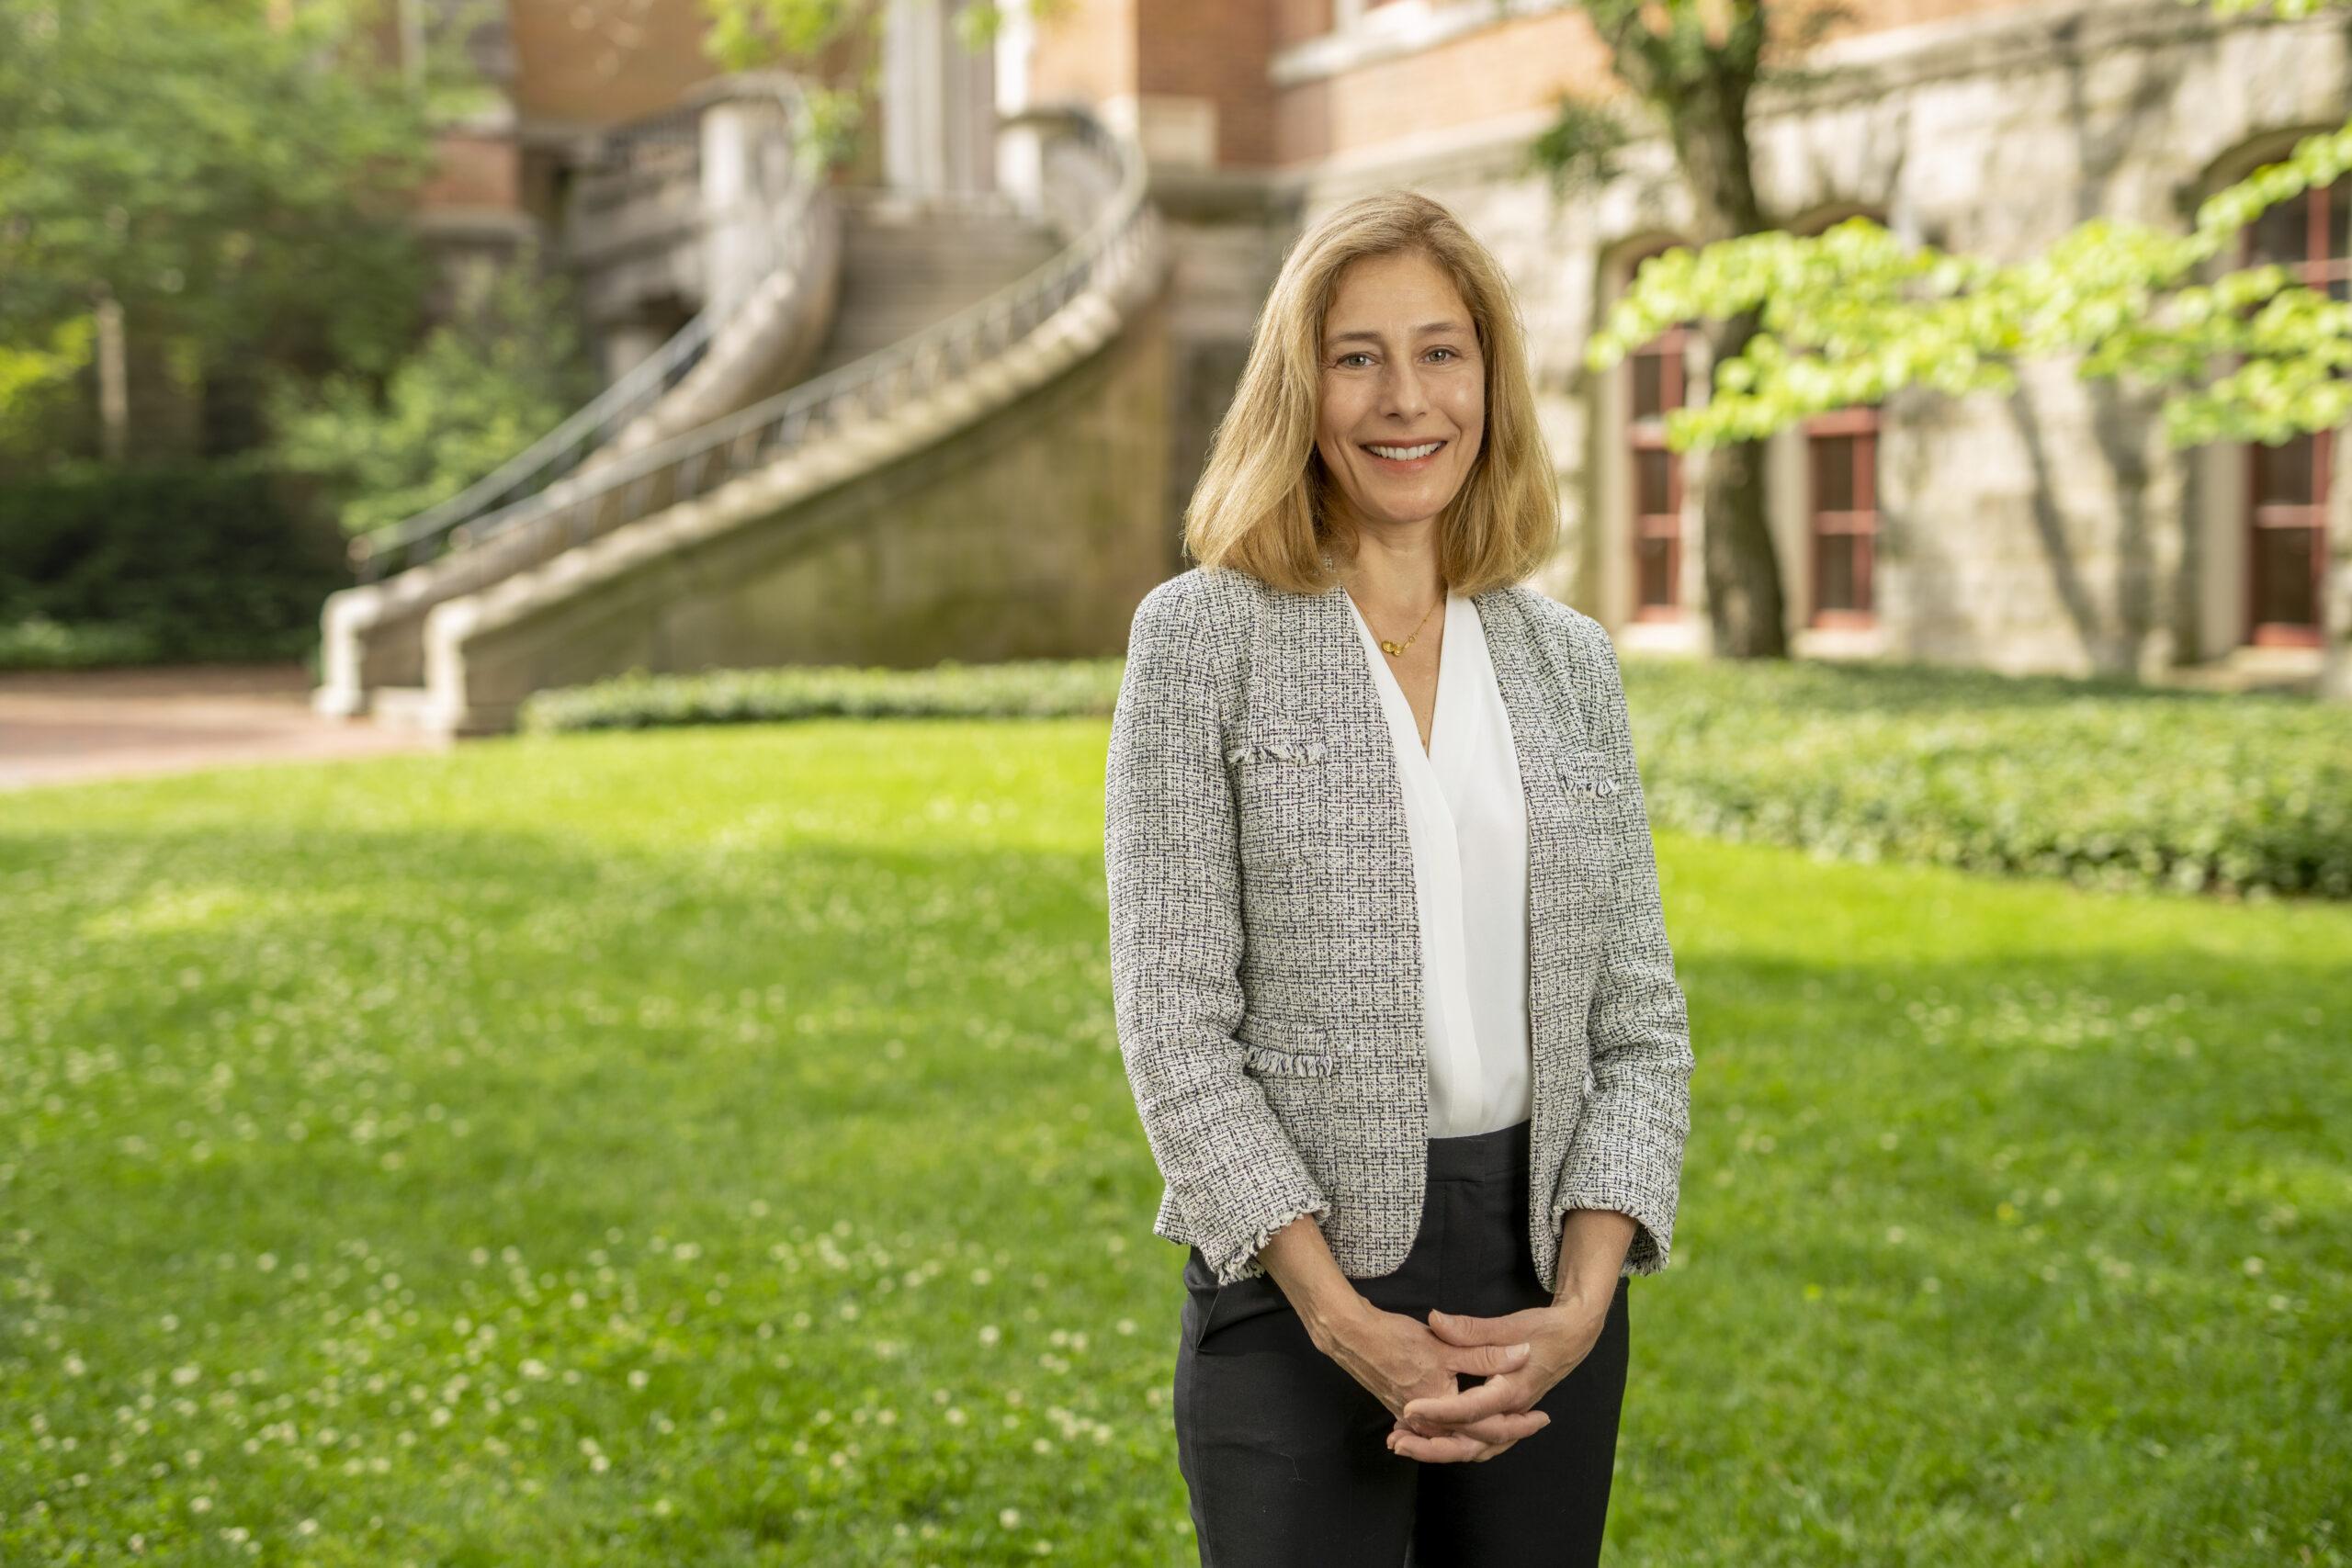 Vanderbilt University Provost, C. Cybele Raver